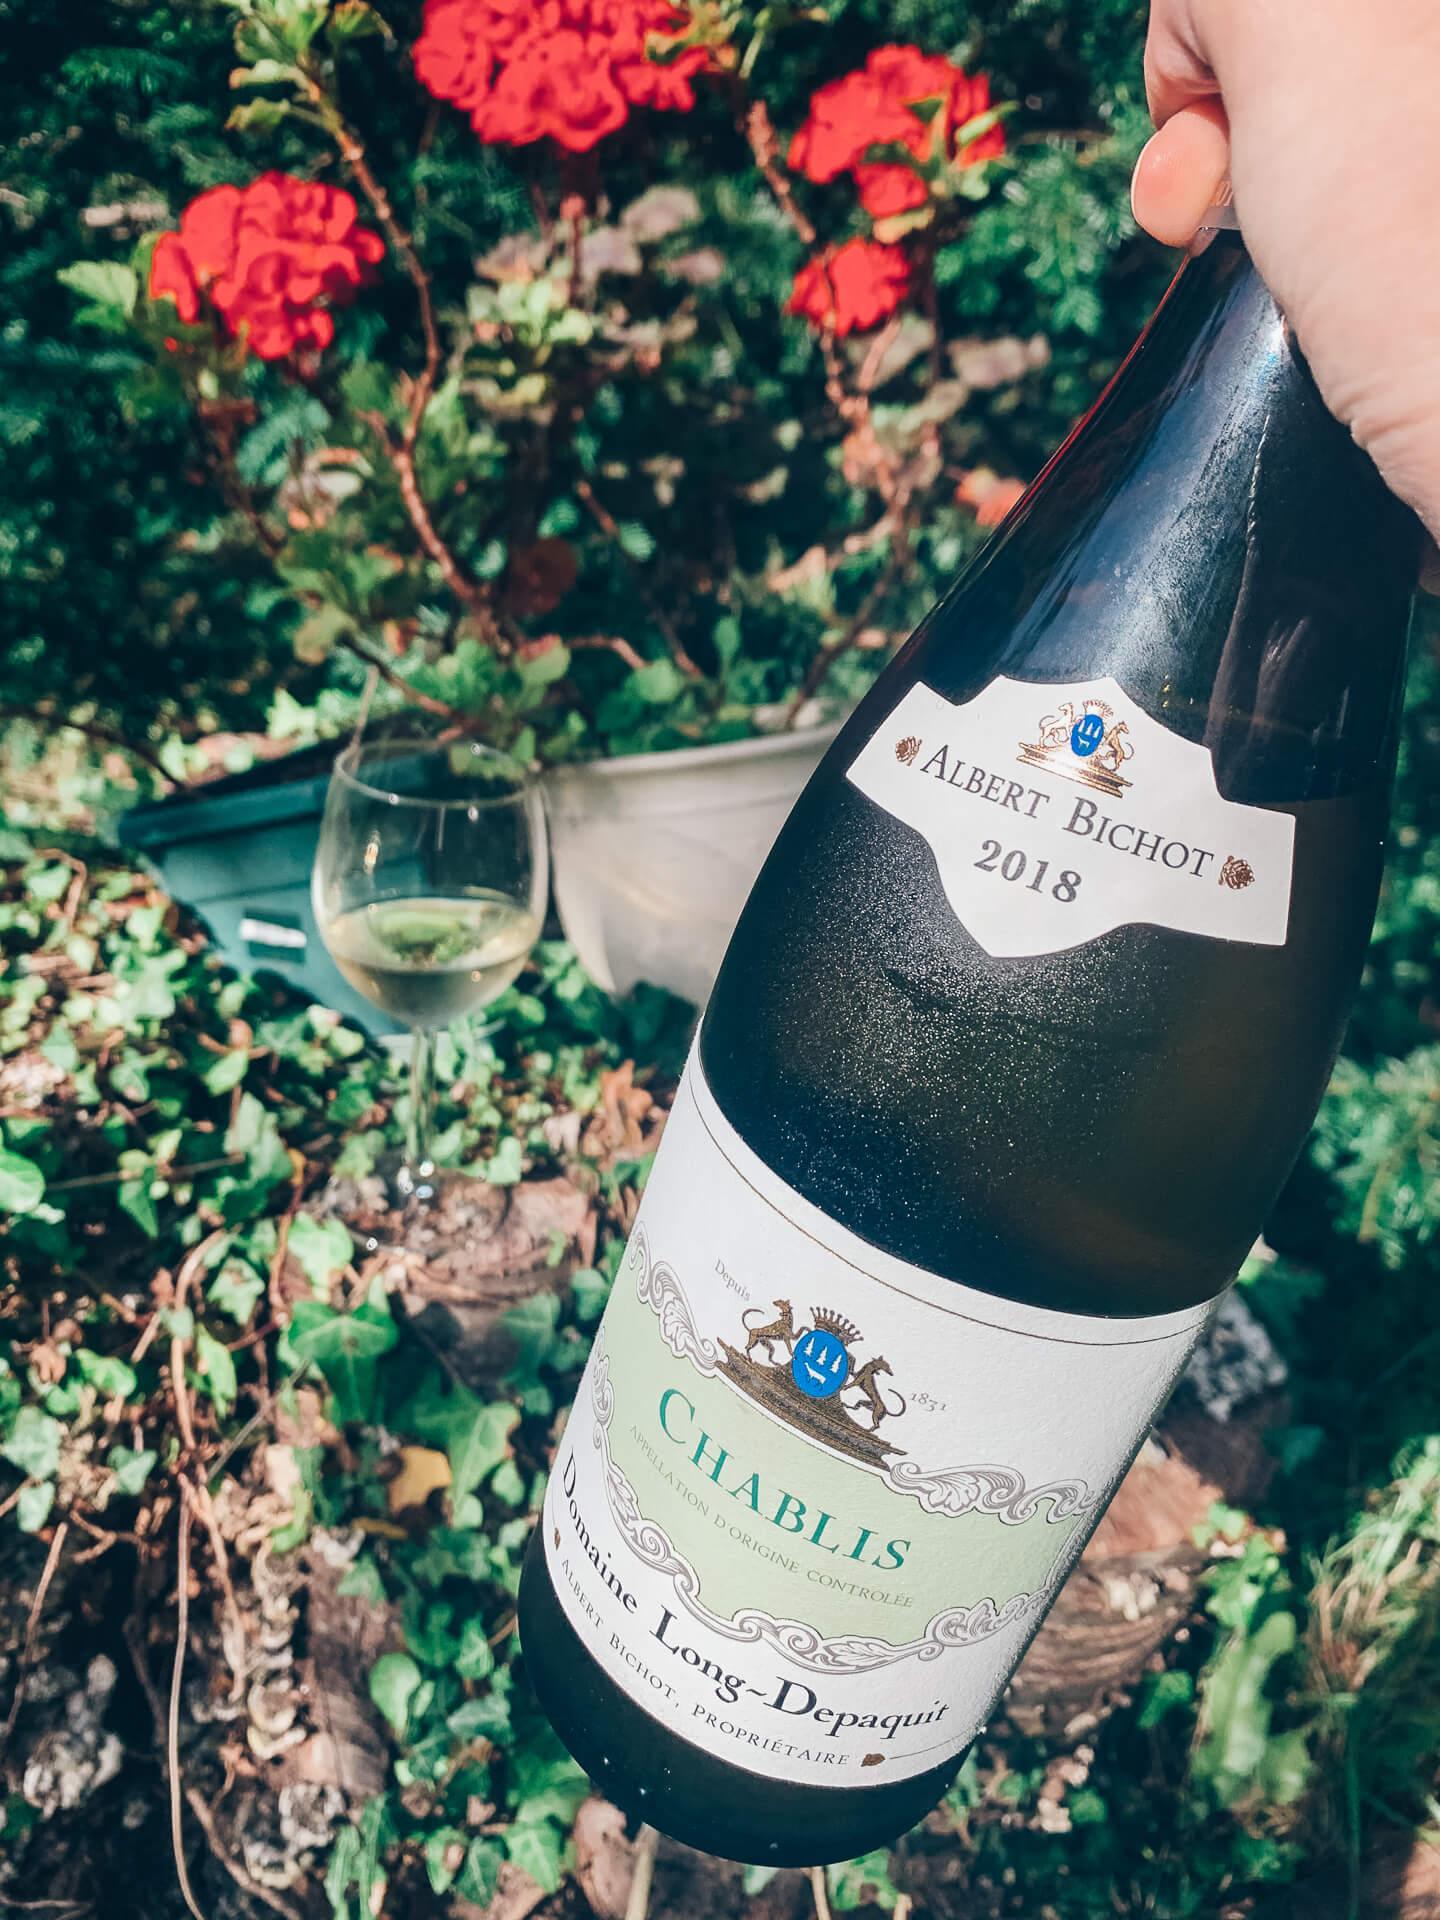 Chablis Bourgogne